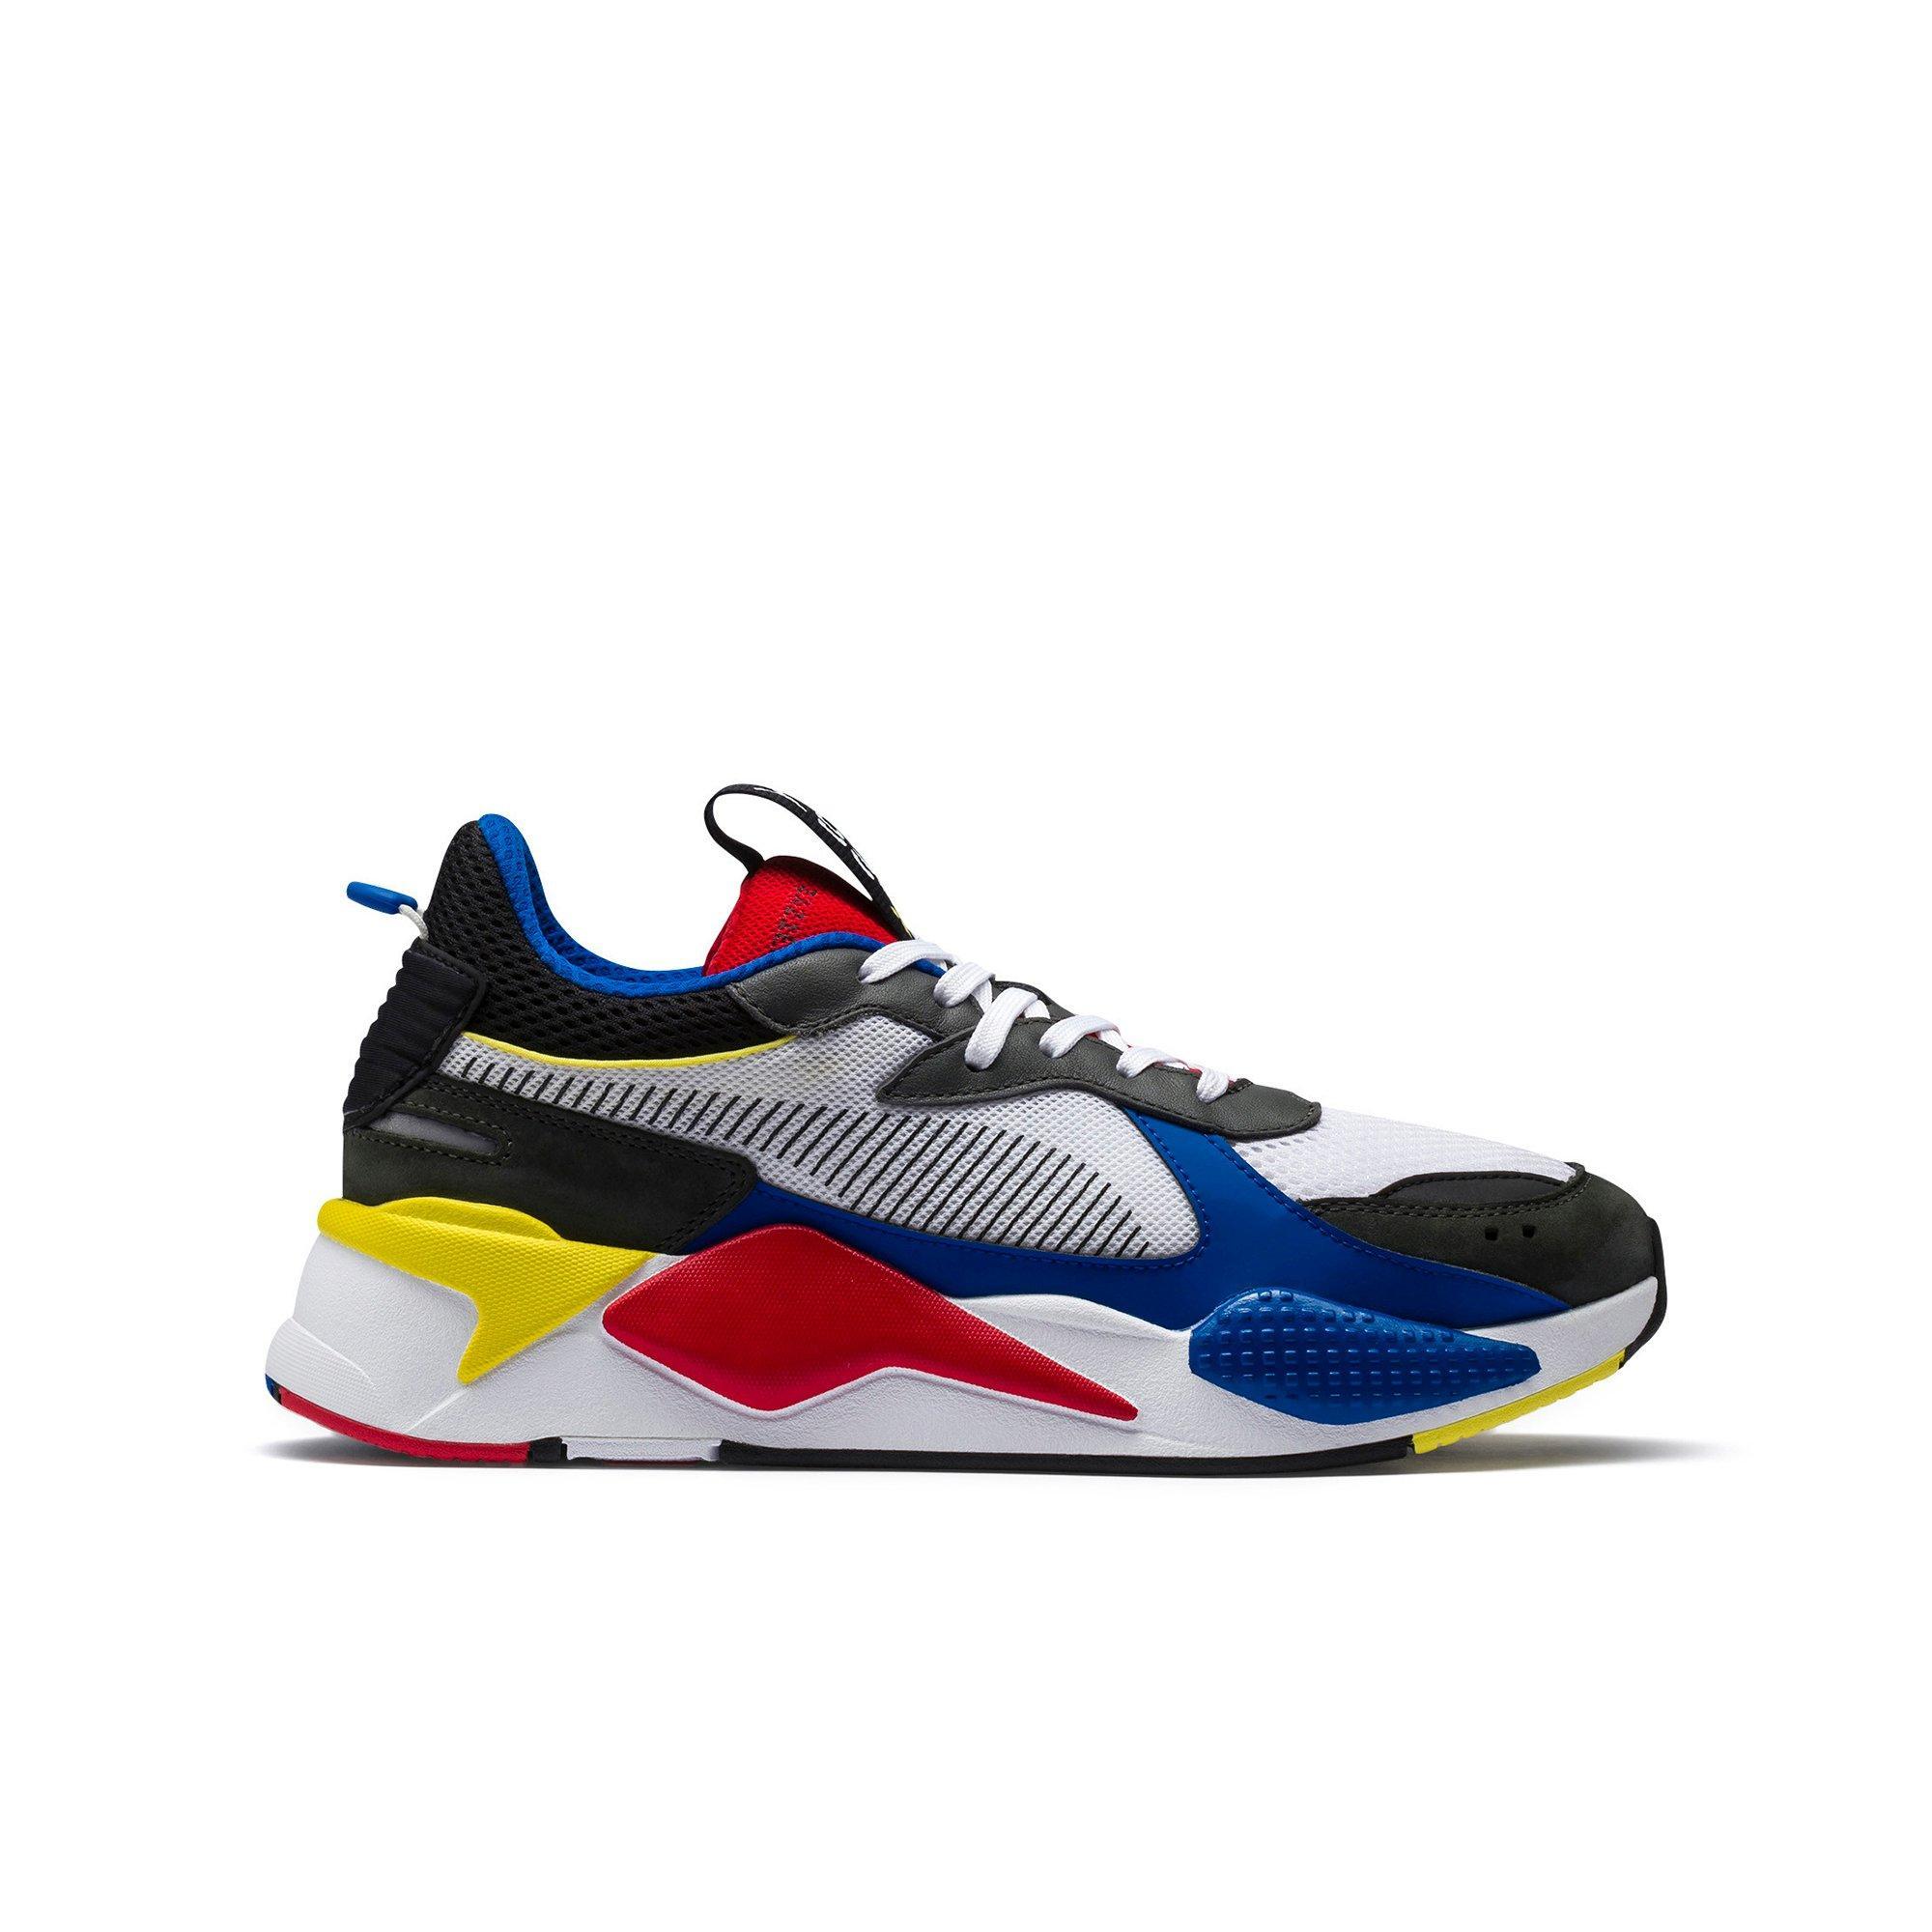 mens mizuno running shoes size 9.5 eu west ping jacket